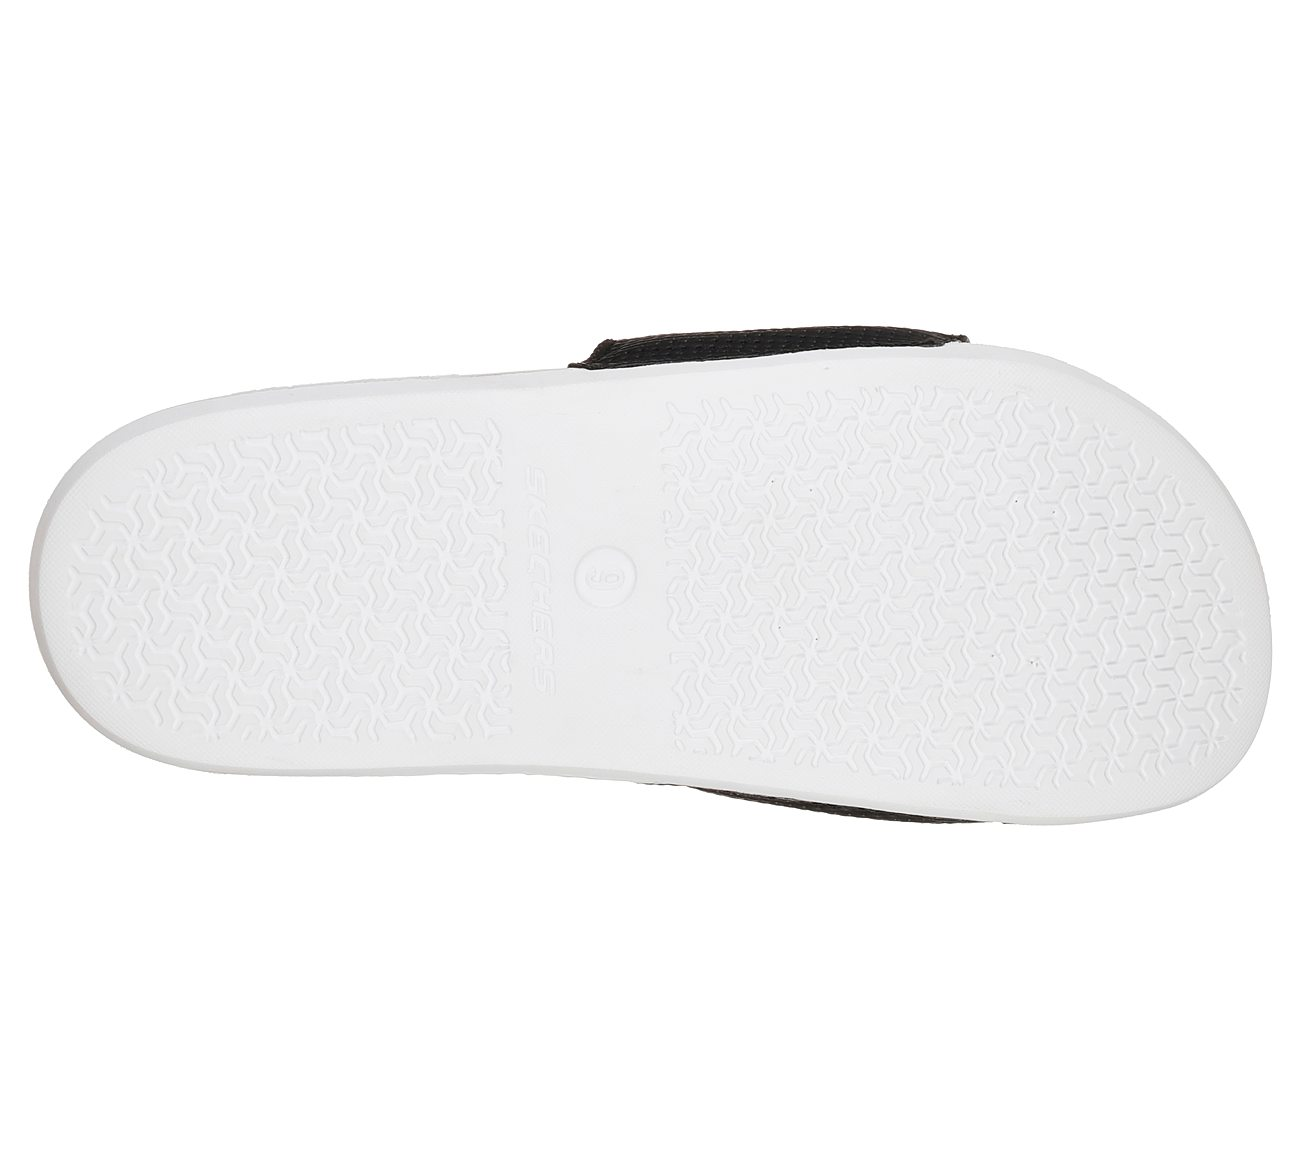 SKECHERS Herrenpantolette Gambix 2.0 verstellbare Riemen Klettverschluss —